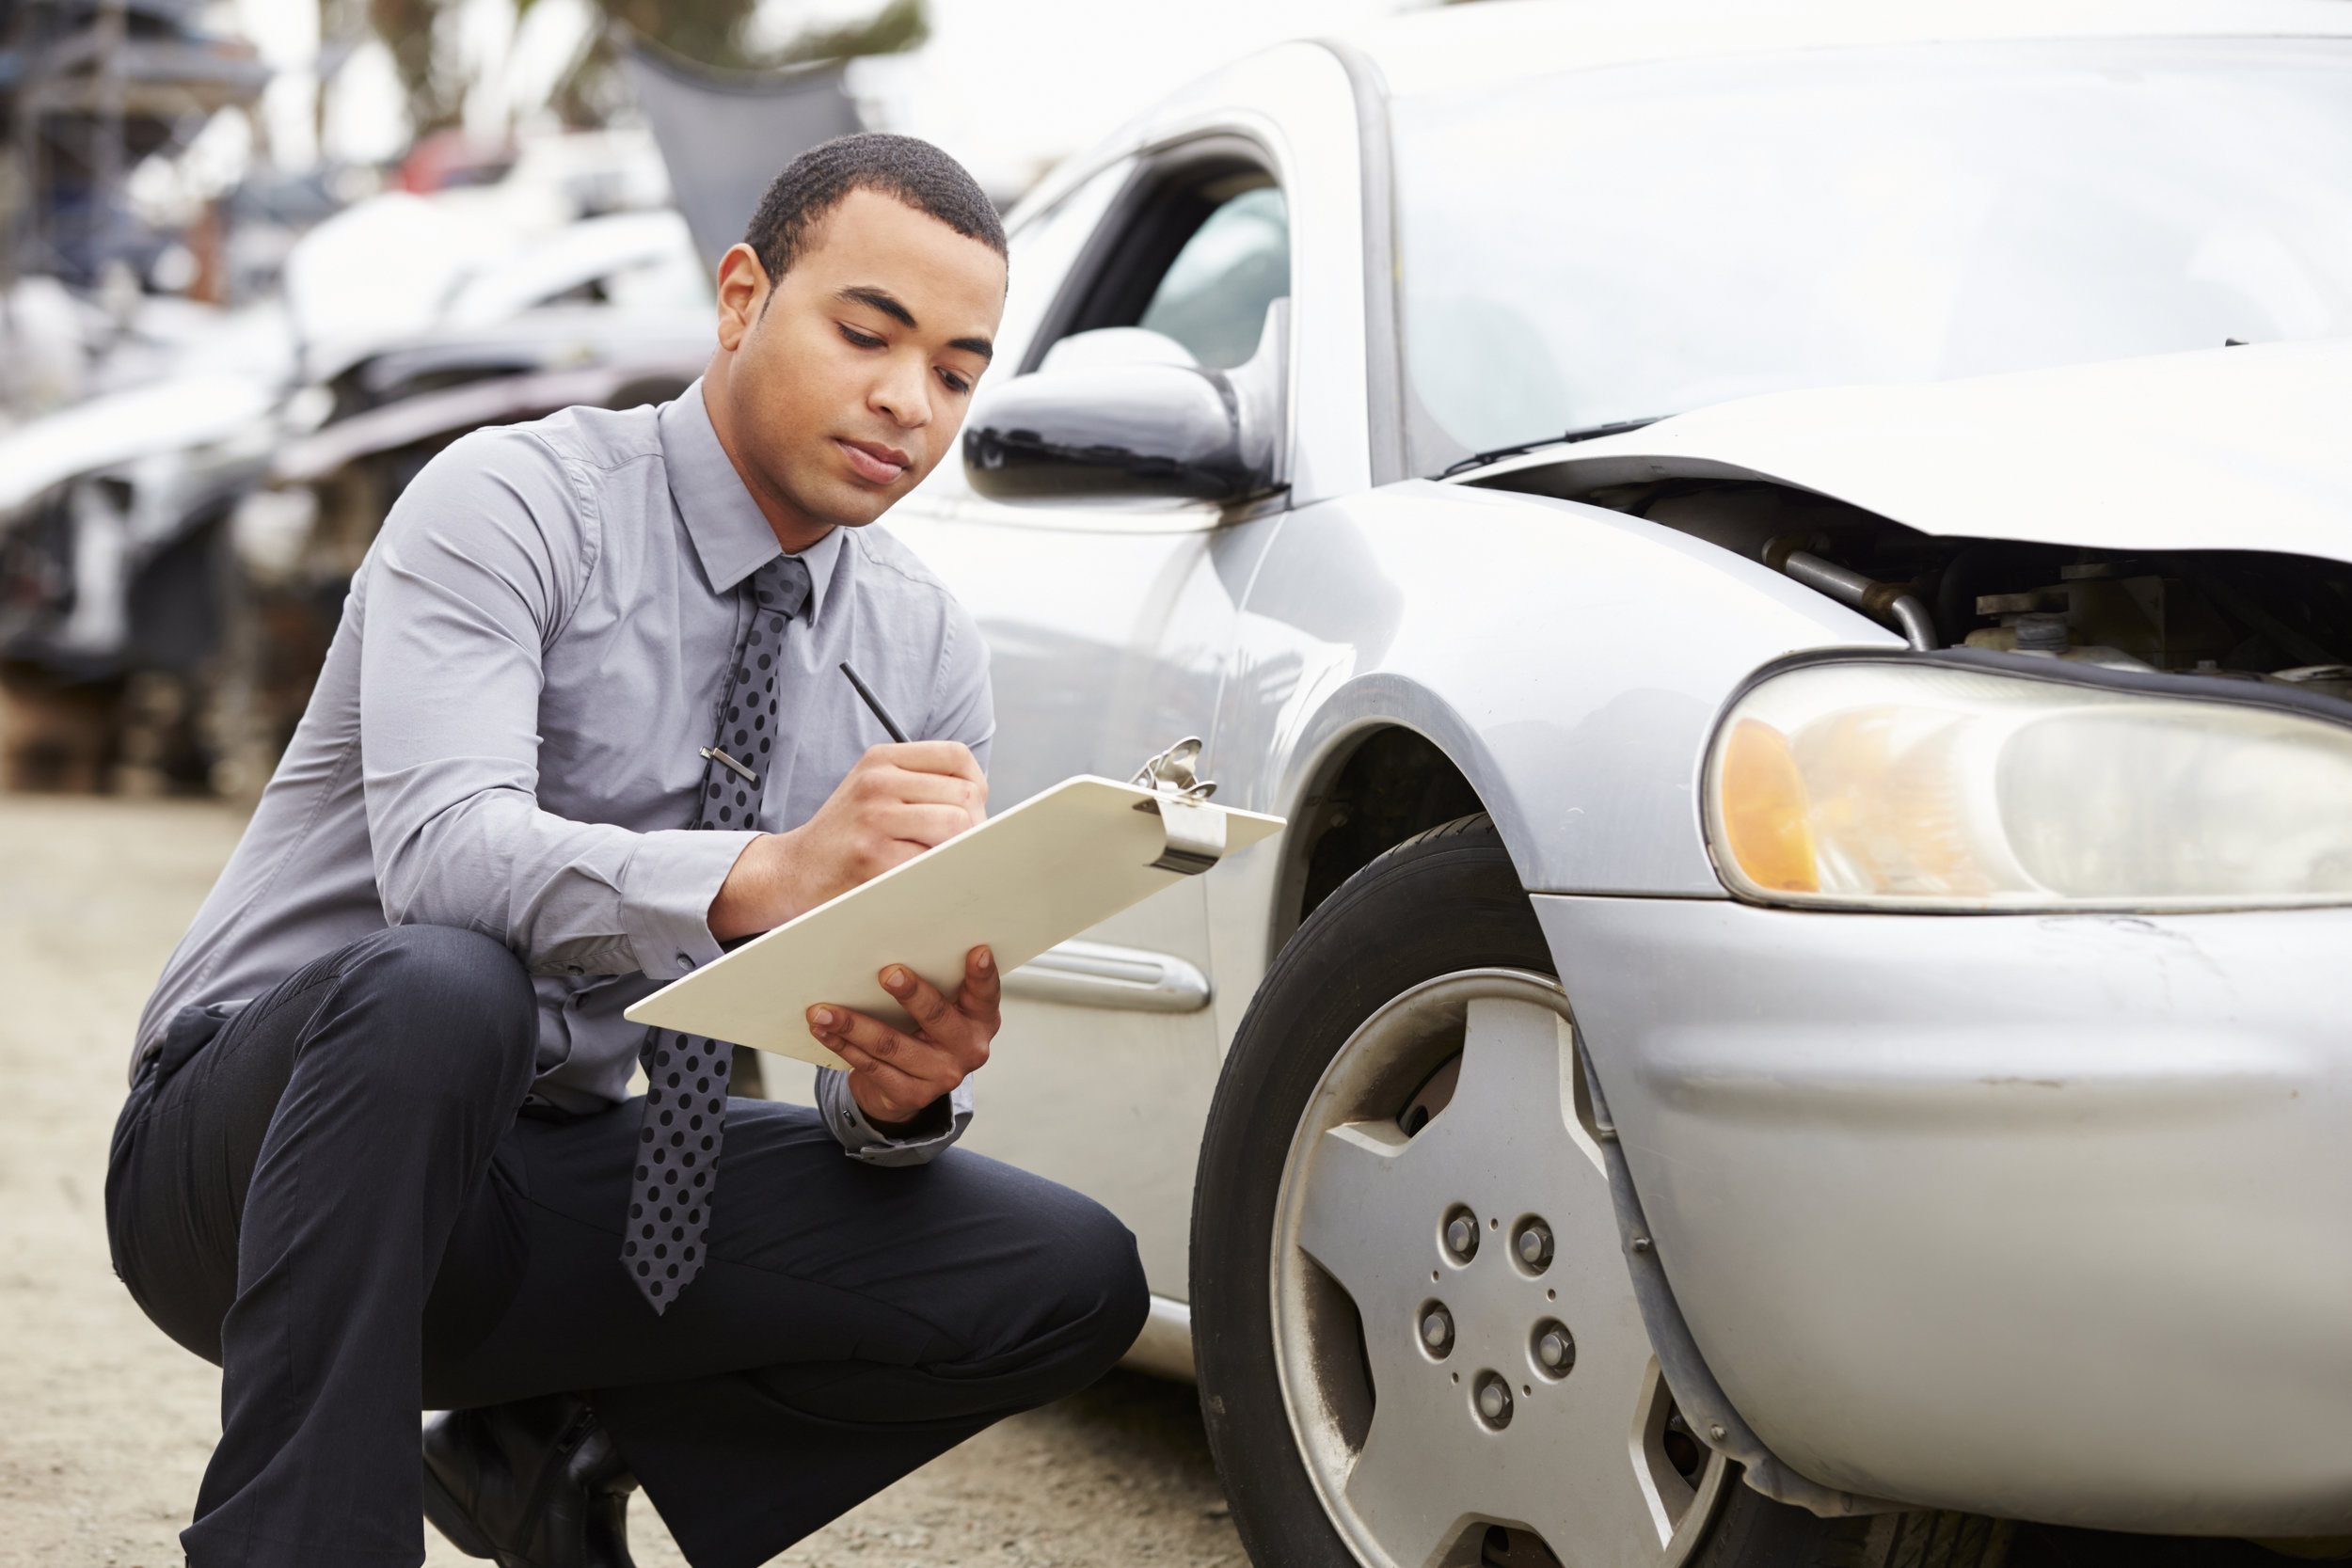 Car Accident Lawyer, Car Wreck Lawyer Charleston, WV, West Virginia Car Accident Attorney